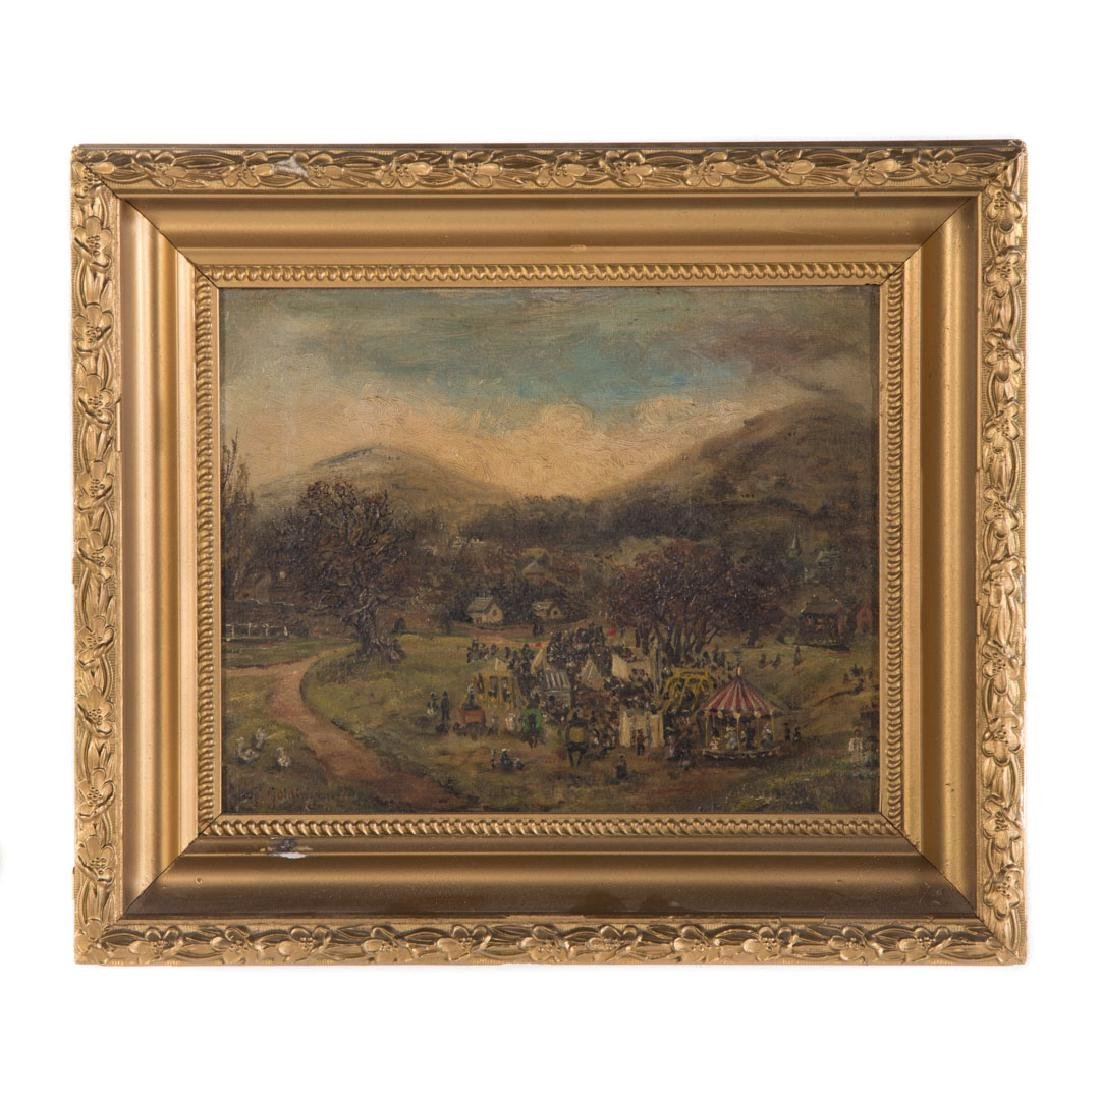 Margaret Goldingham. County Fair, oil on canvas